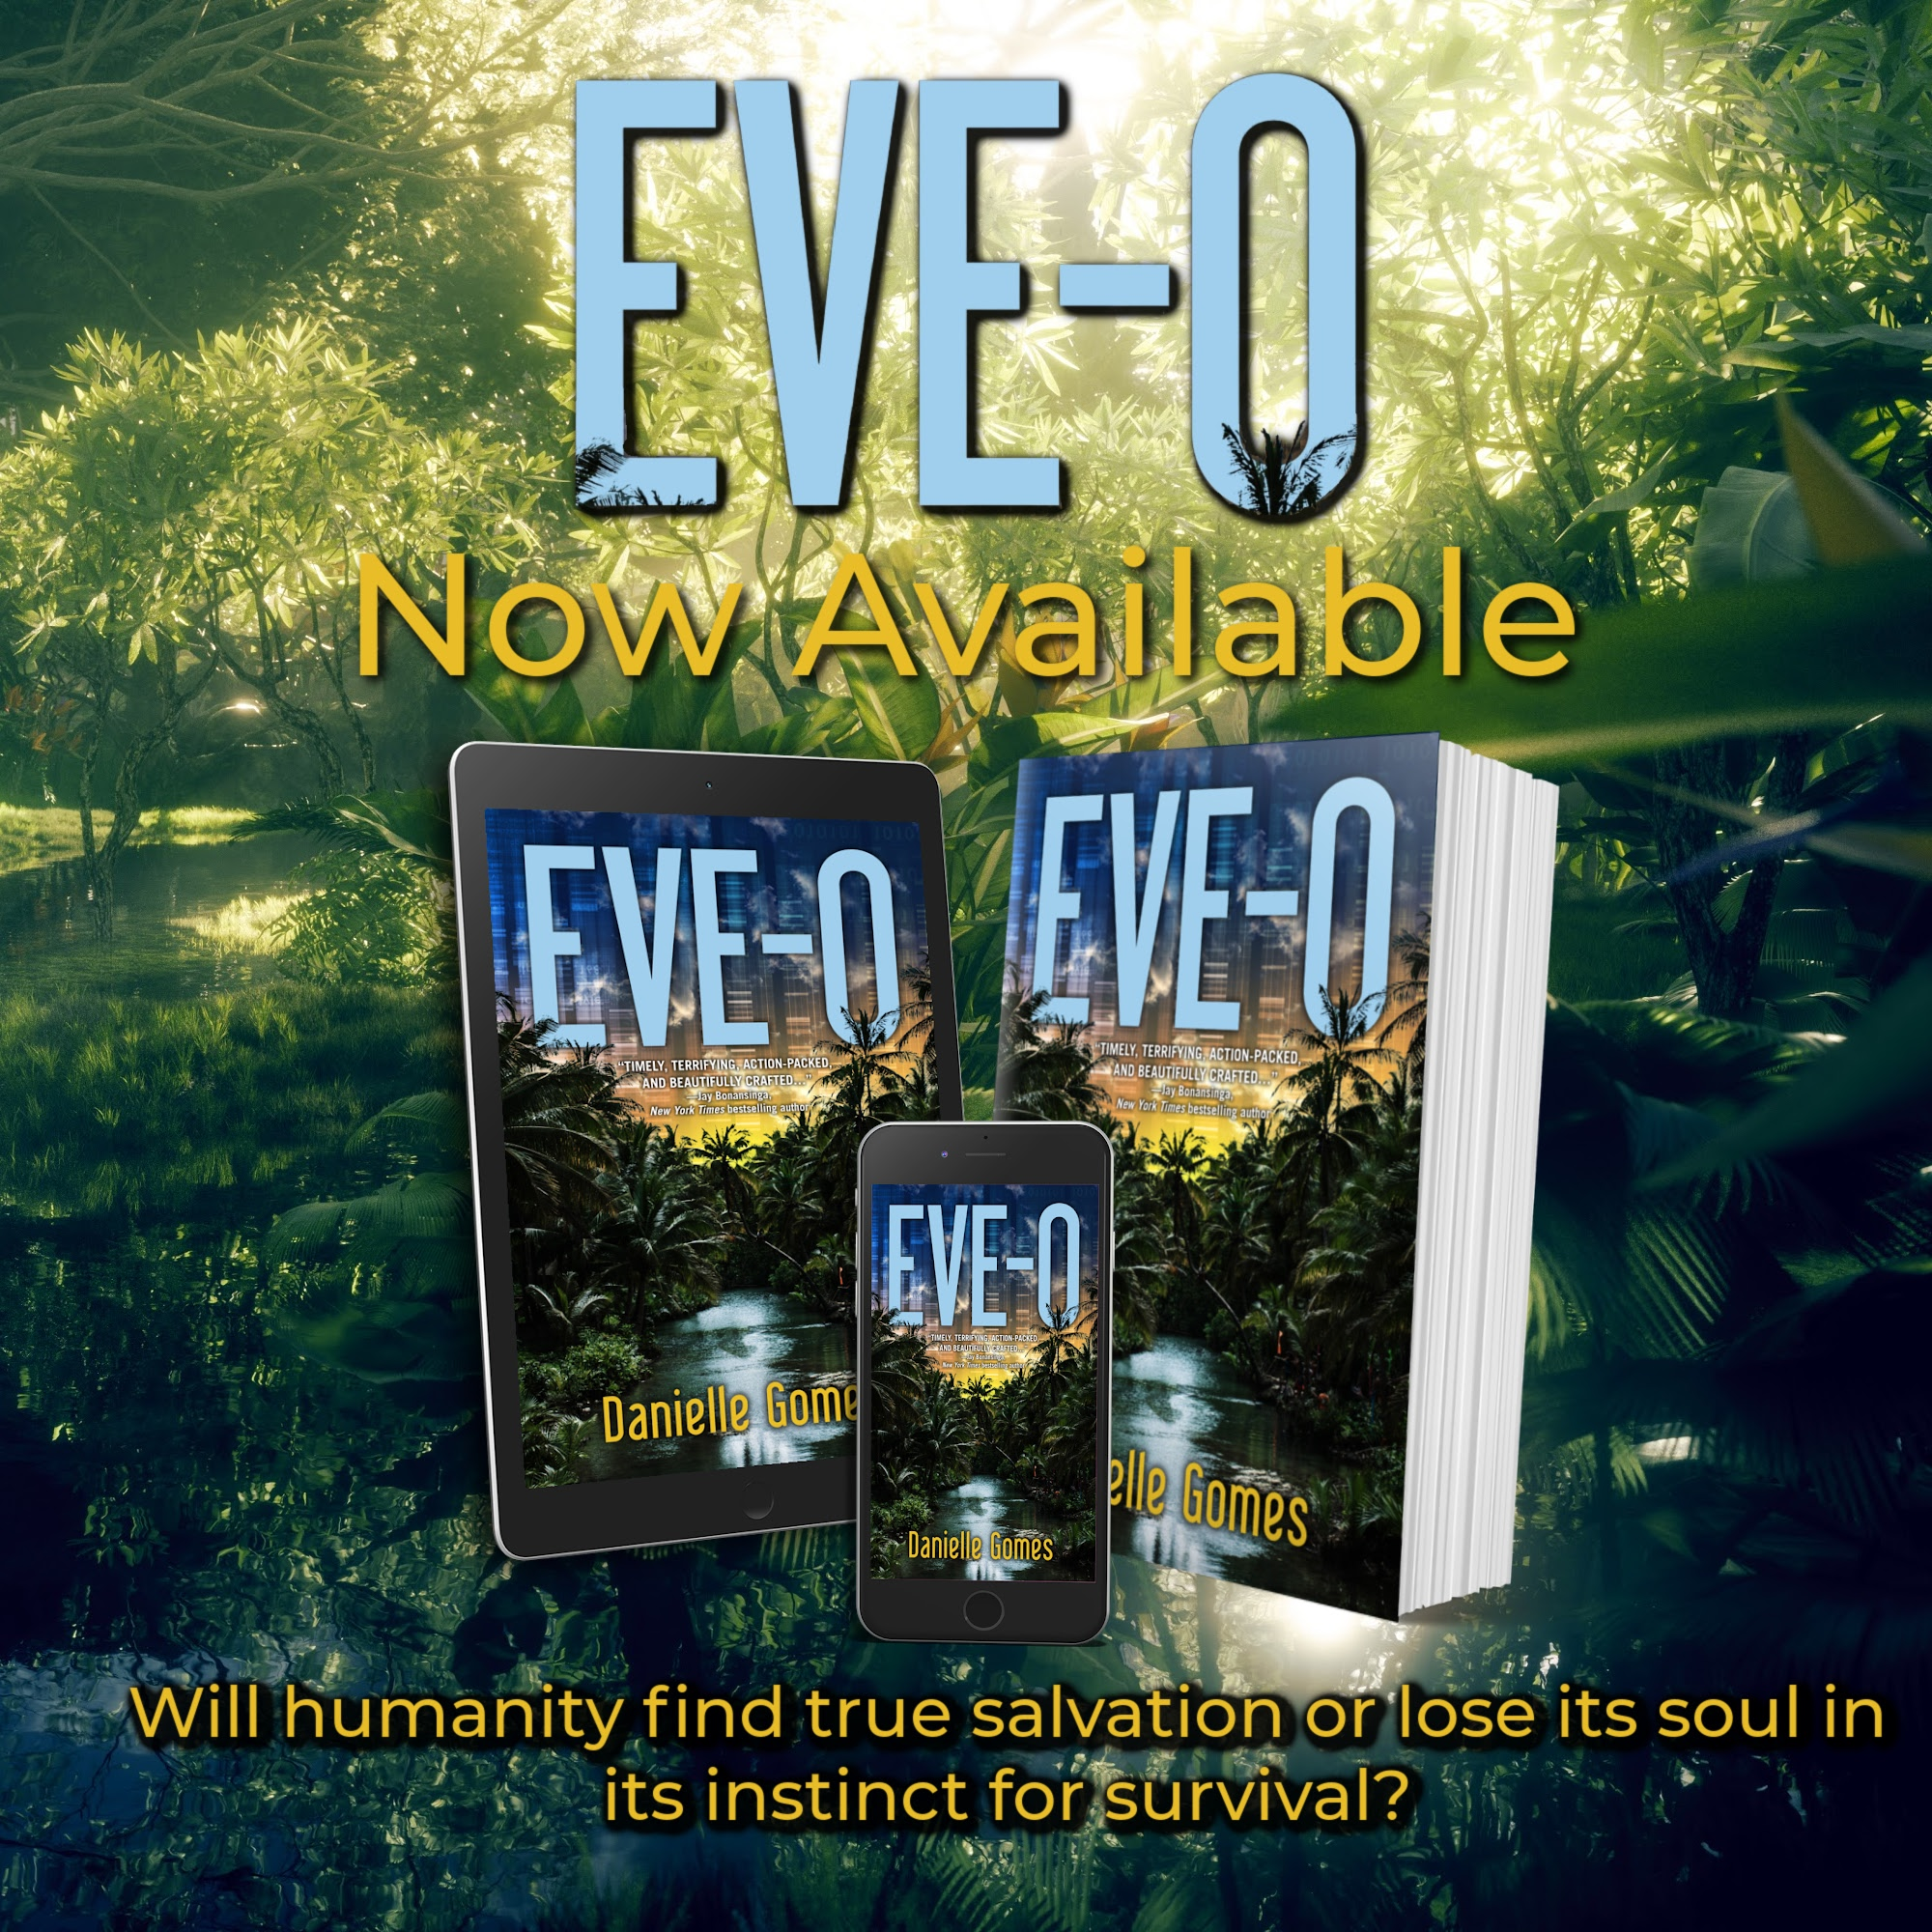 Eve-0 Tour Sq 1